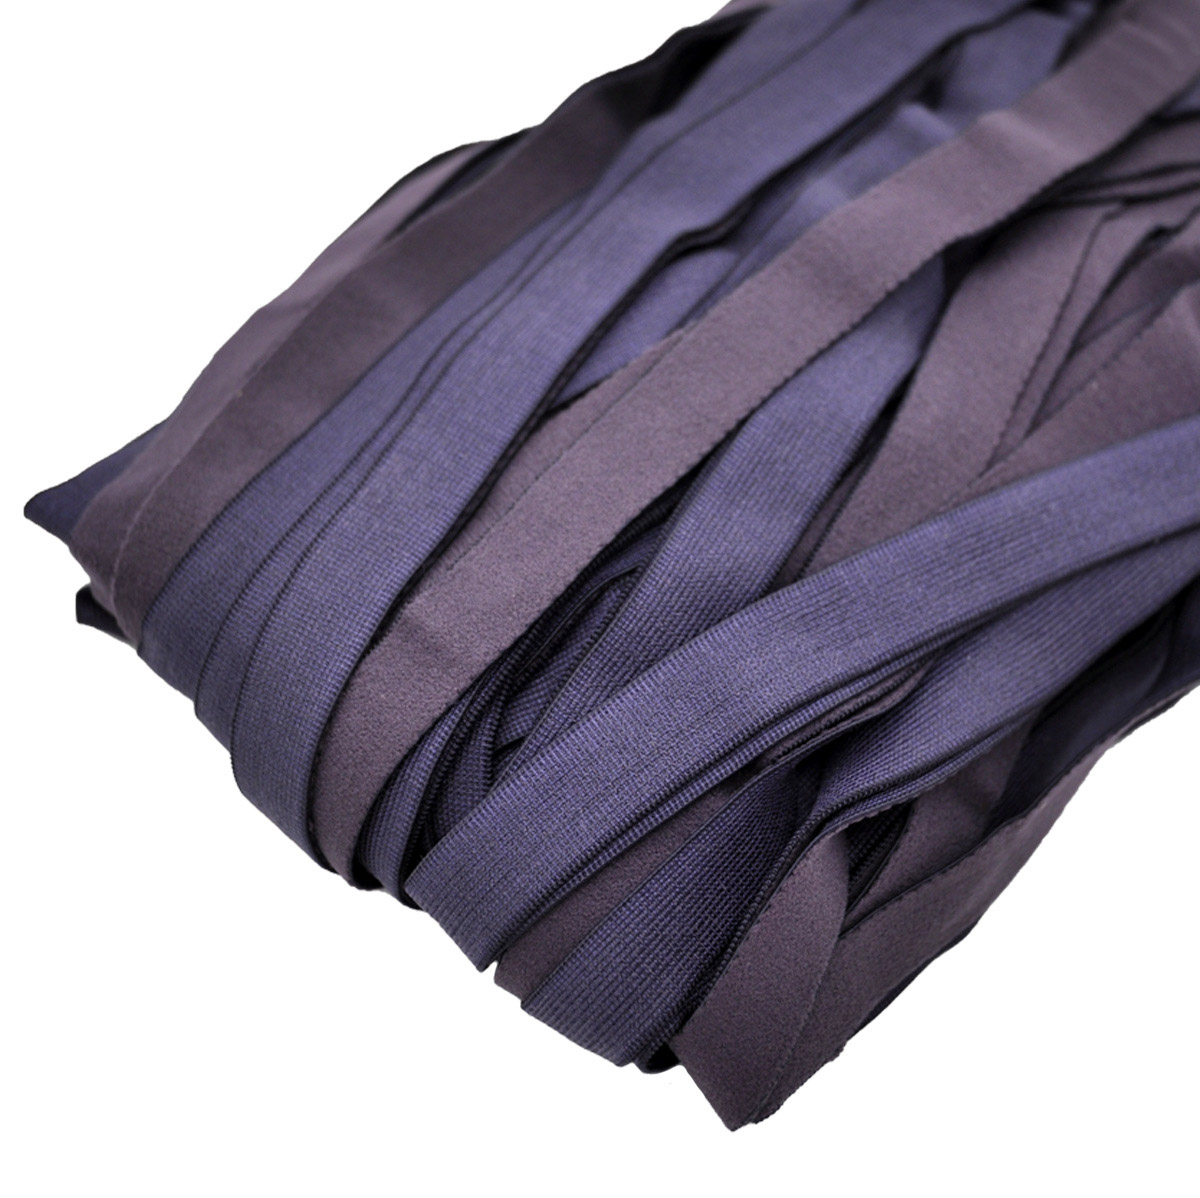 STP/21 эластичная отделочная лента 14мм*25м, фиолетовый